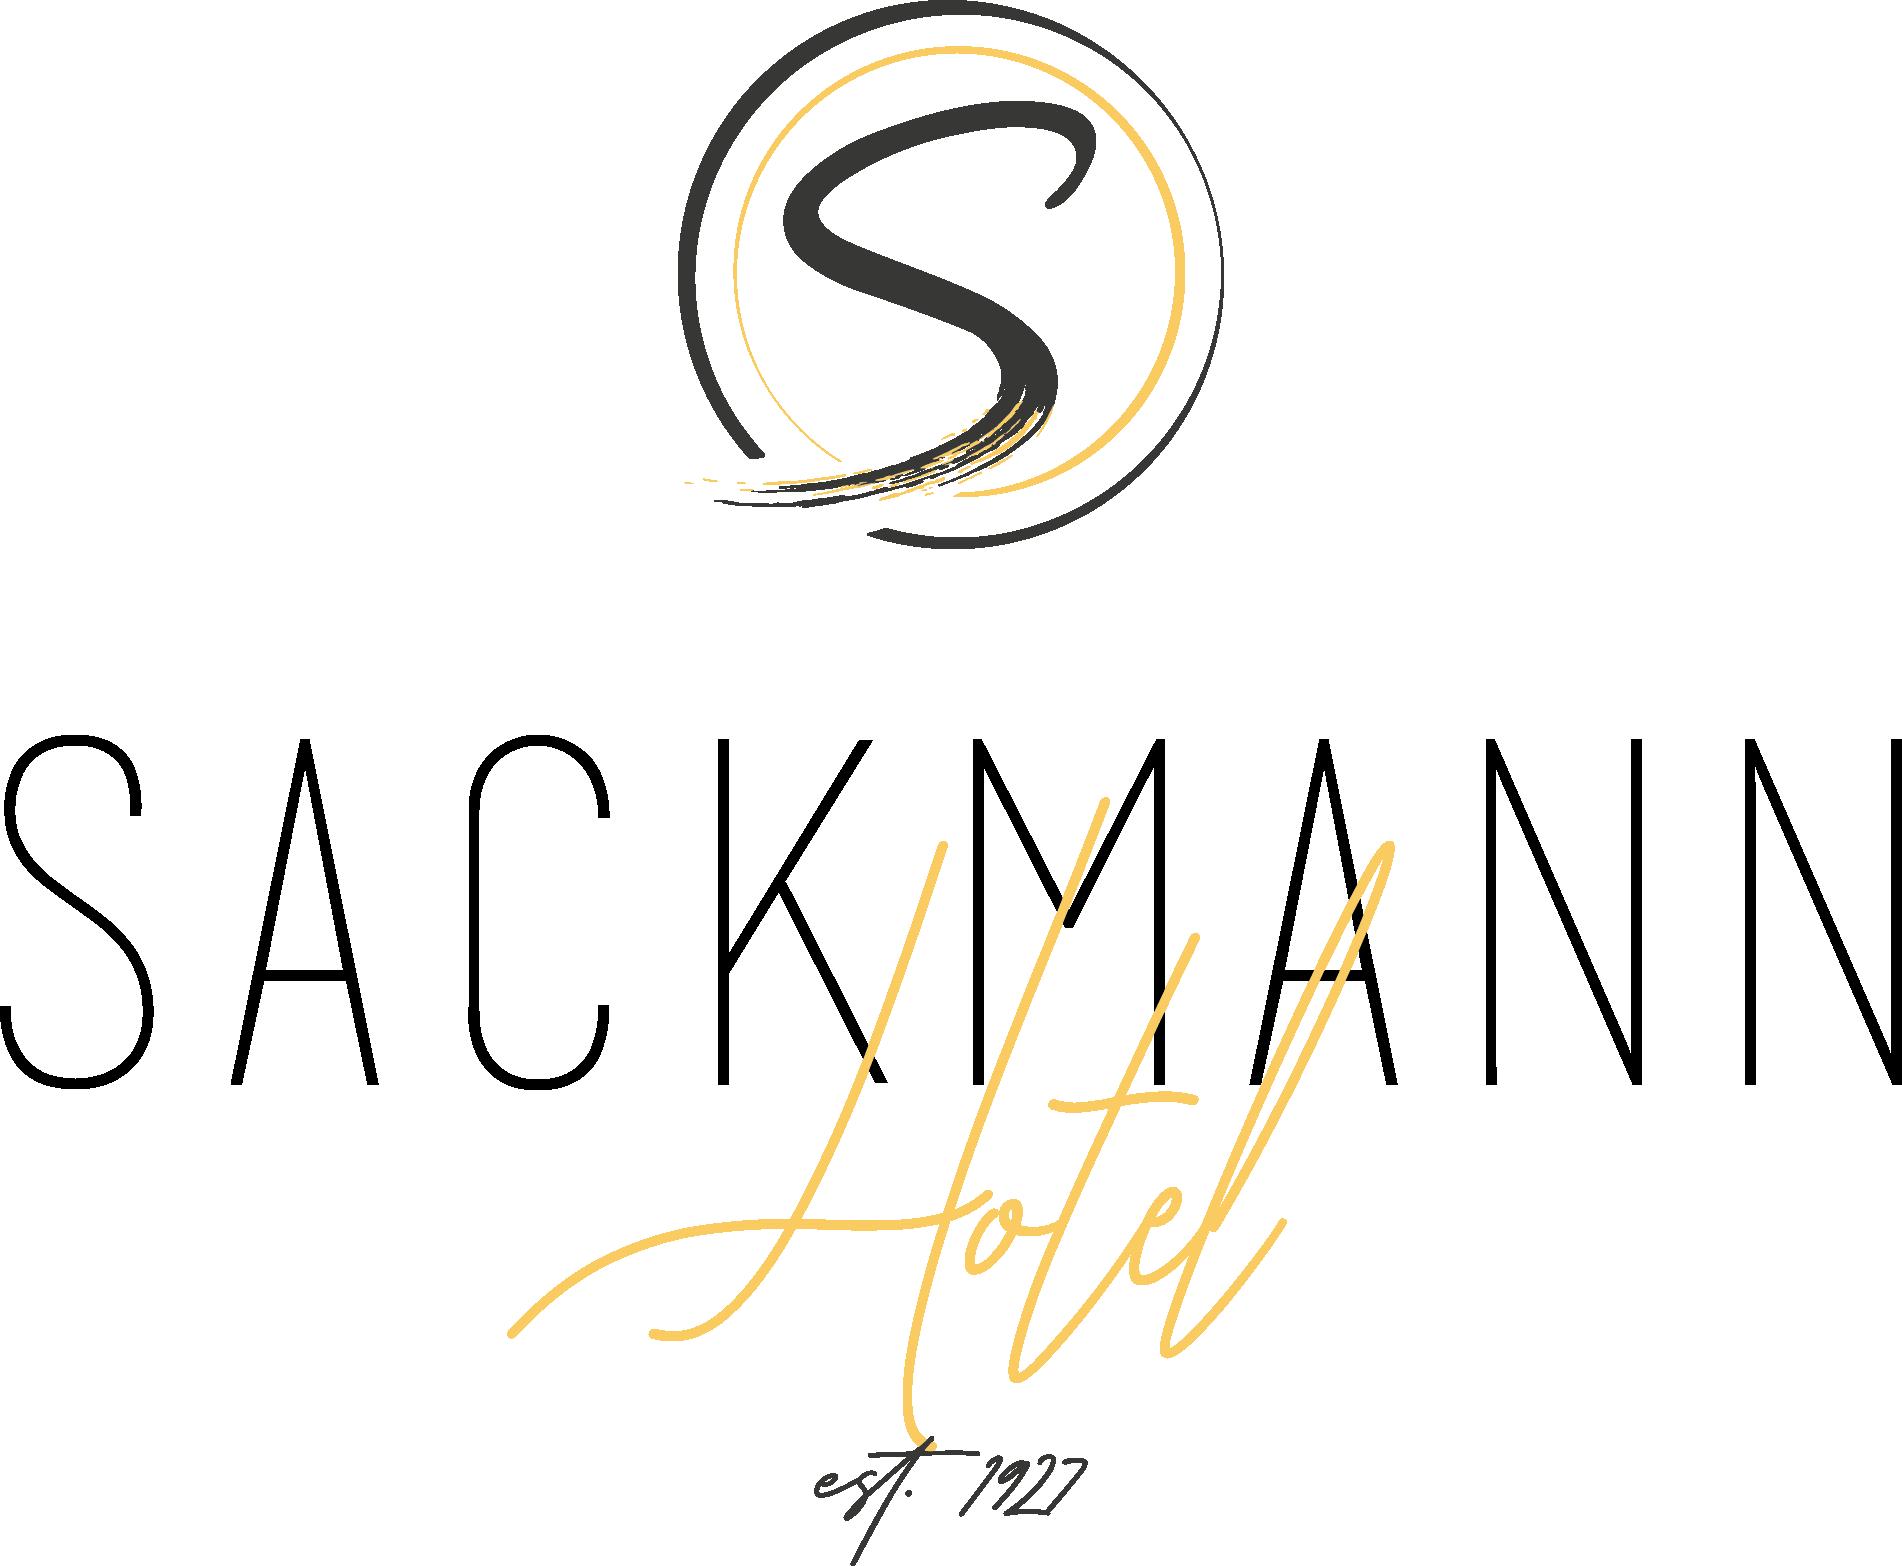 Hotel Sackmann GmbH Logo